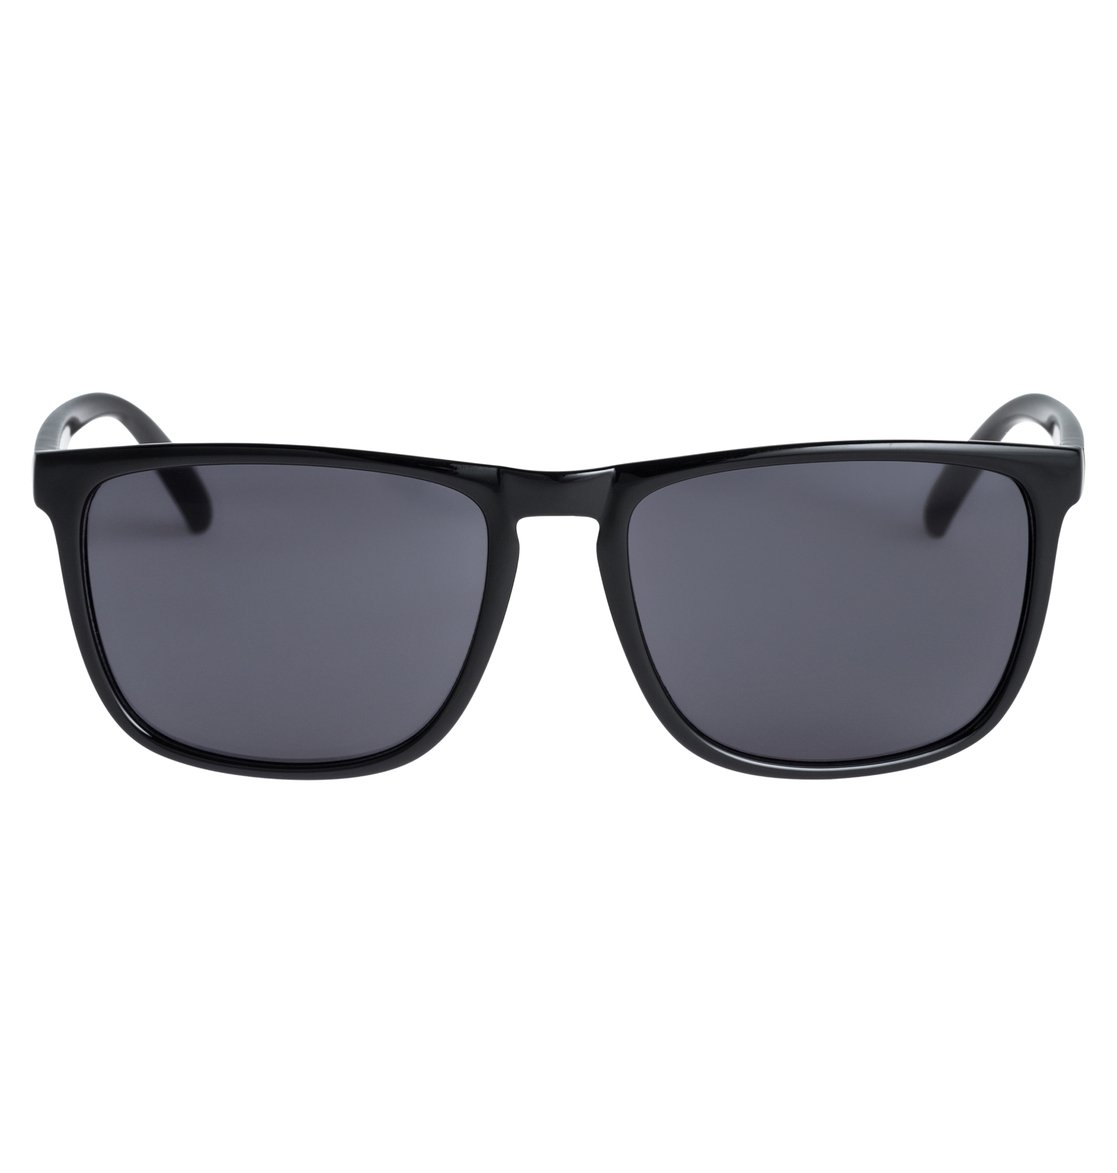 black shades glasses  Men\u0027s DC Sunglasses EDYEY03003